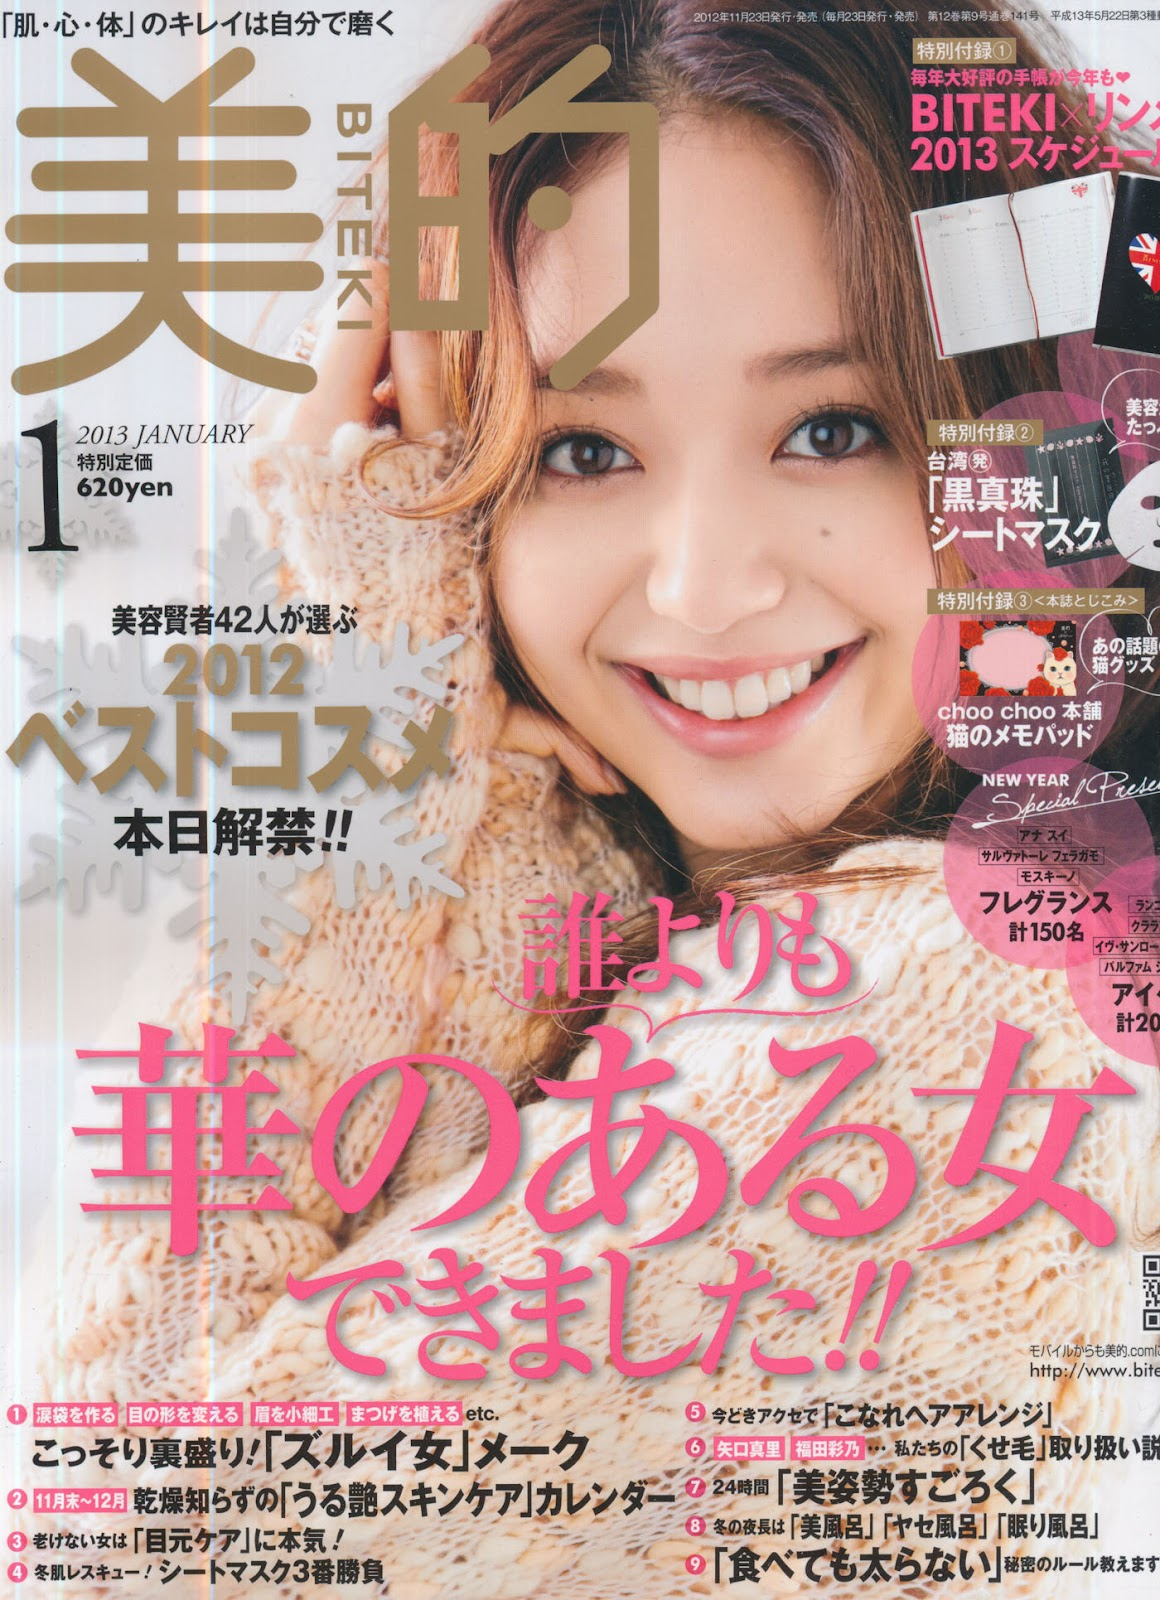 issue 06 ls-magazine | Image - 8 (max 2000)